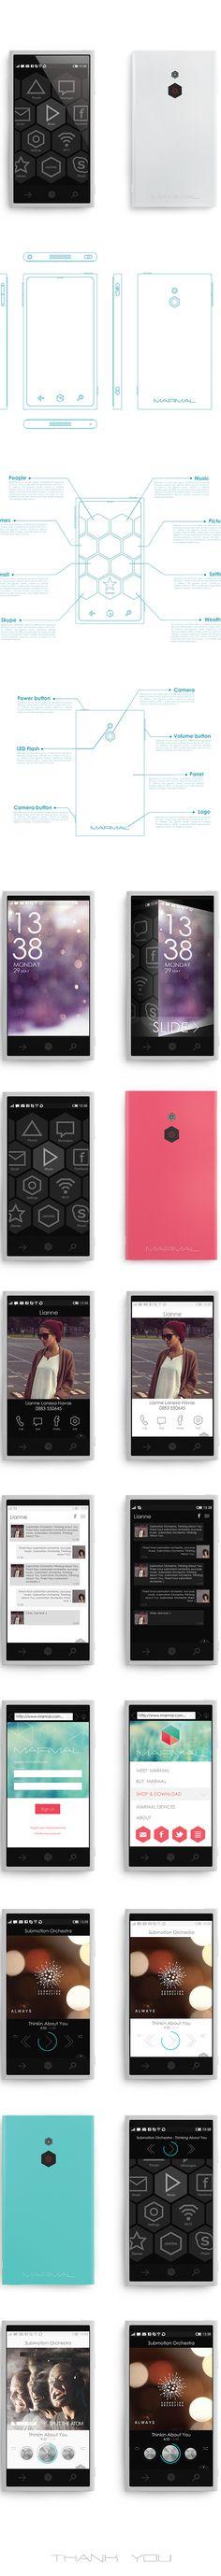 Mobile Software Marmal by Monika Kusheva, via Behance